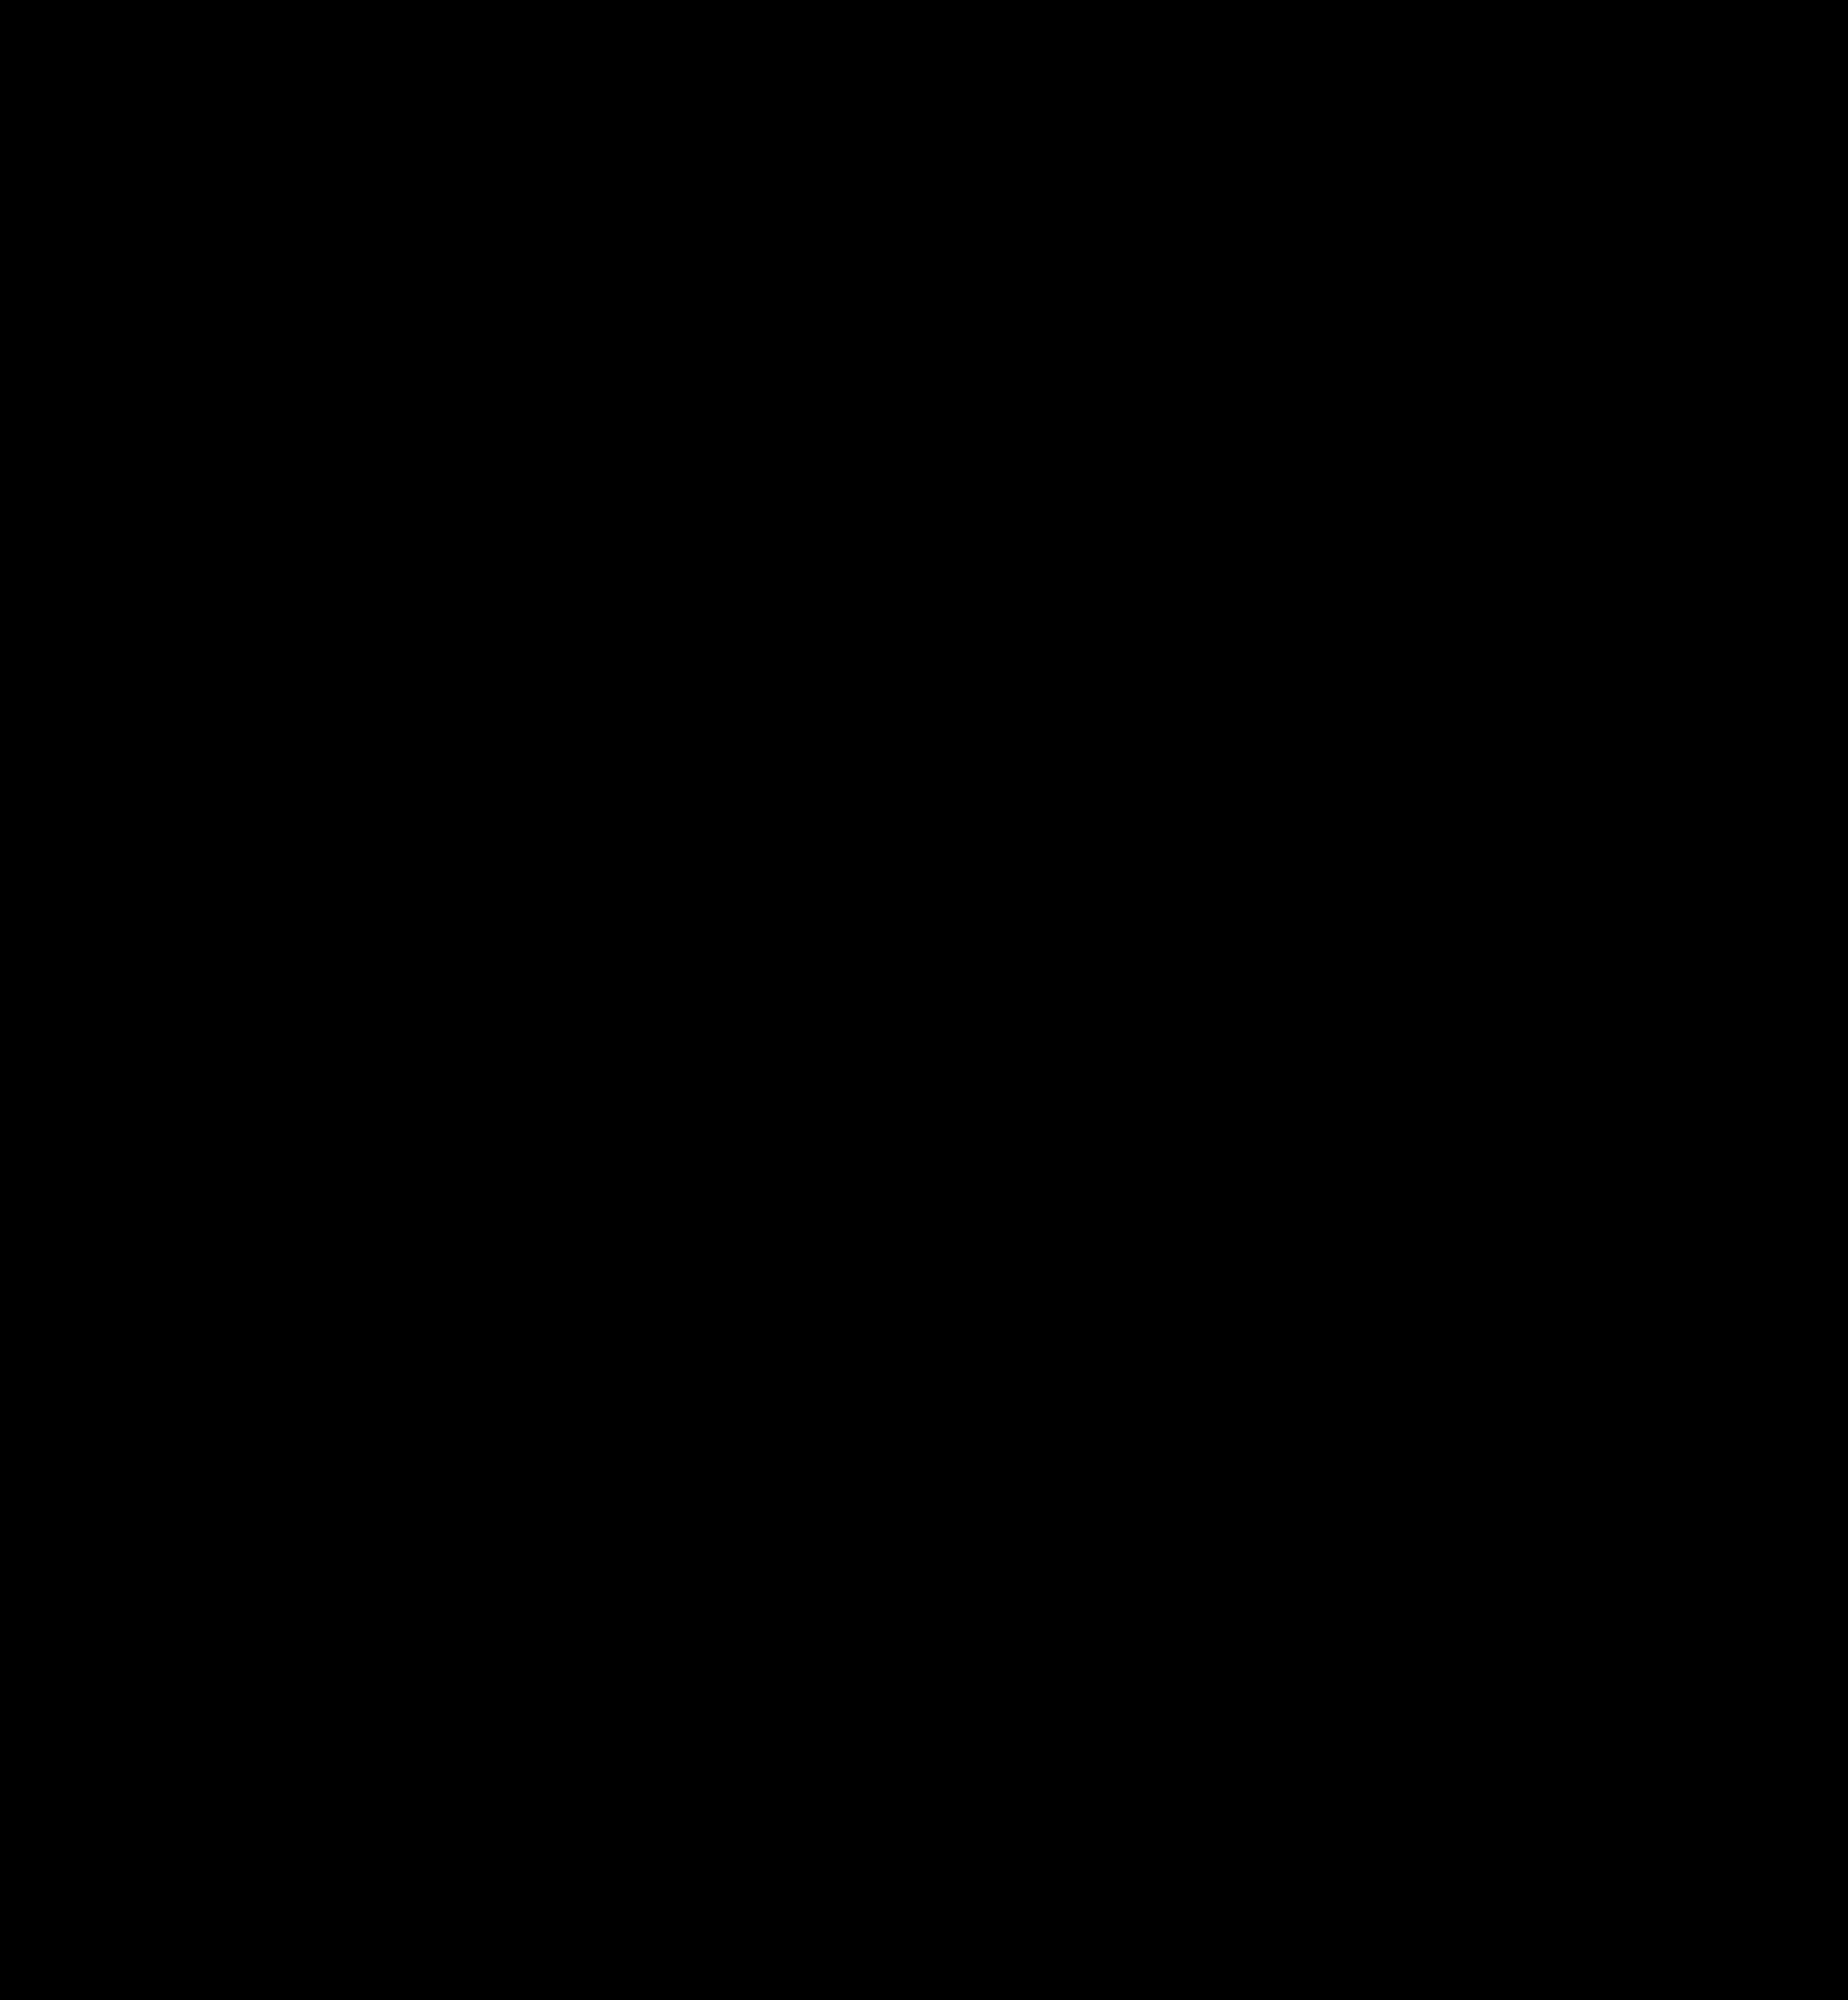 Dragon Ball Z Lineart : Dragon ball kid goku lineart by superjmanplay on